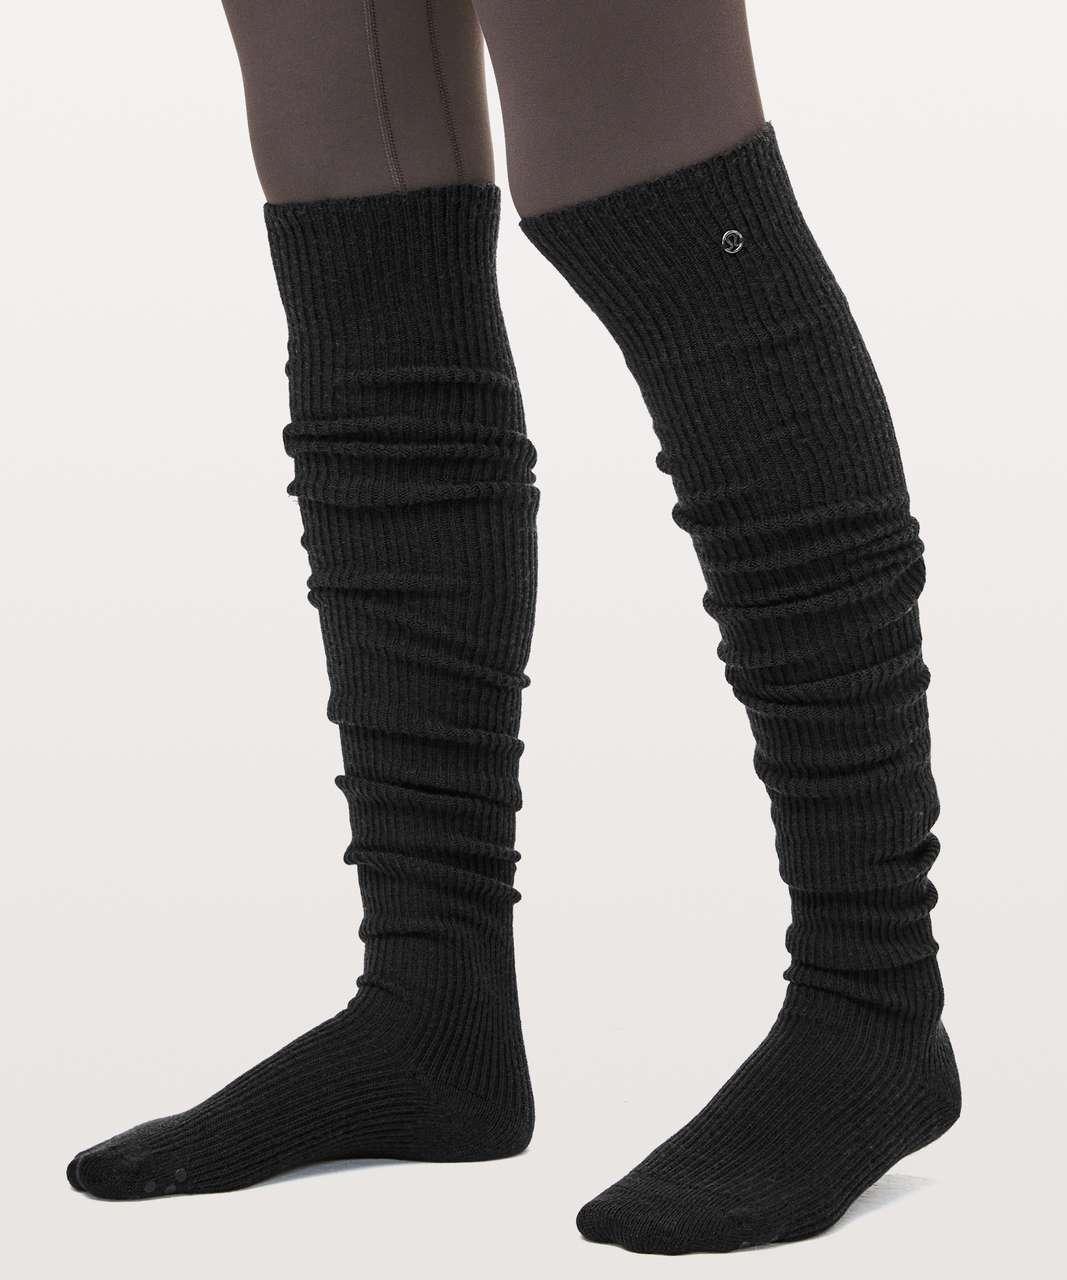 9e1a1f8ab9d Lululemon Savasana Sock - Black - lulu fanatics